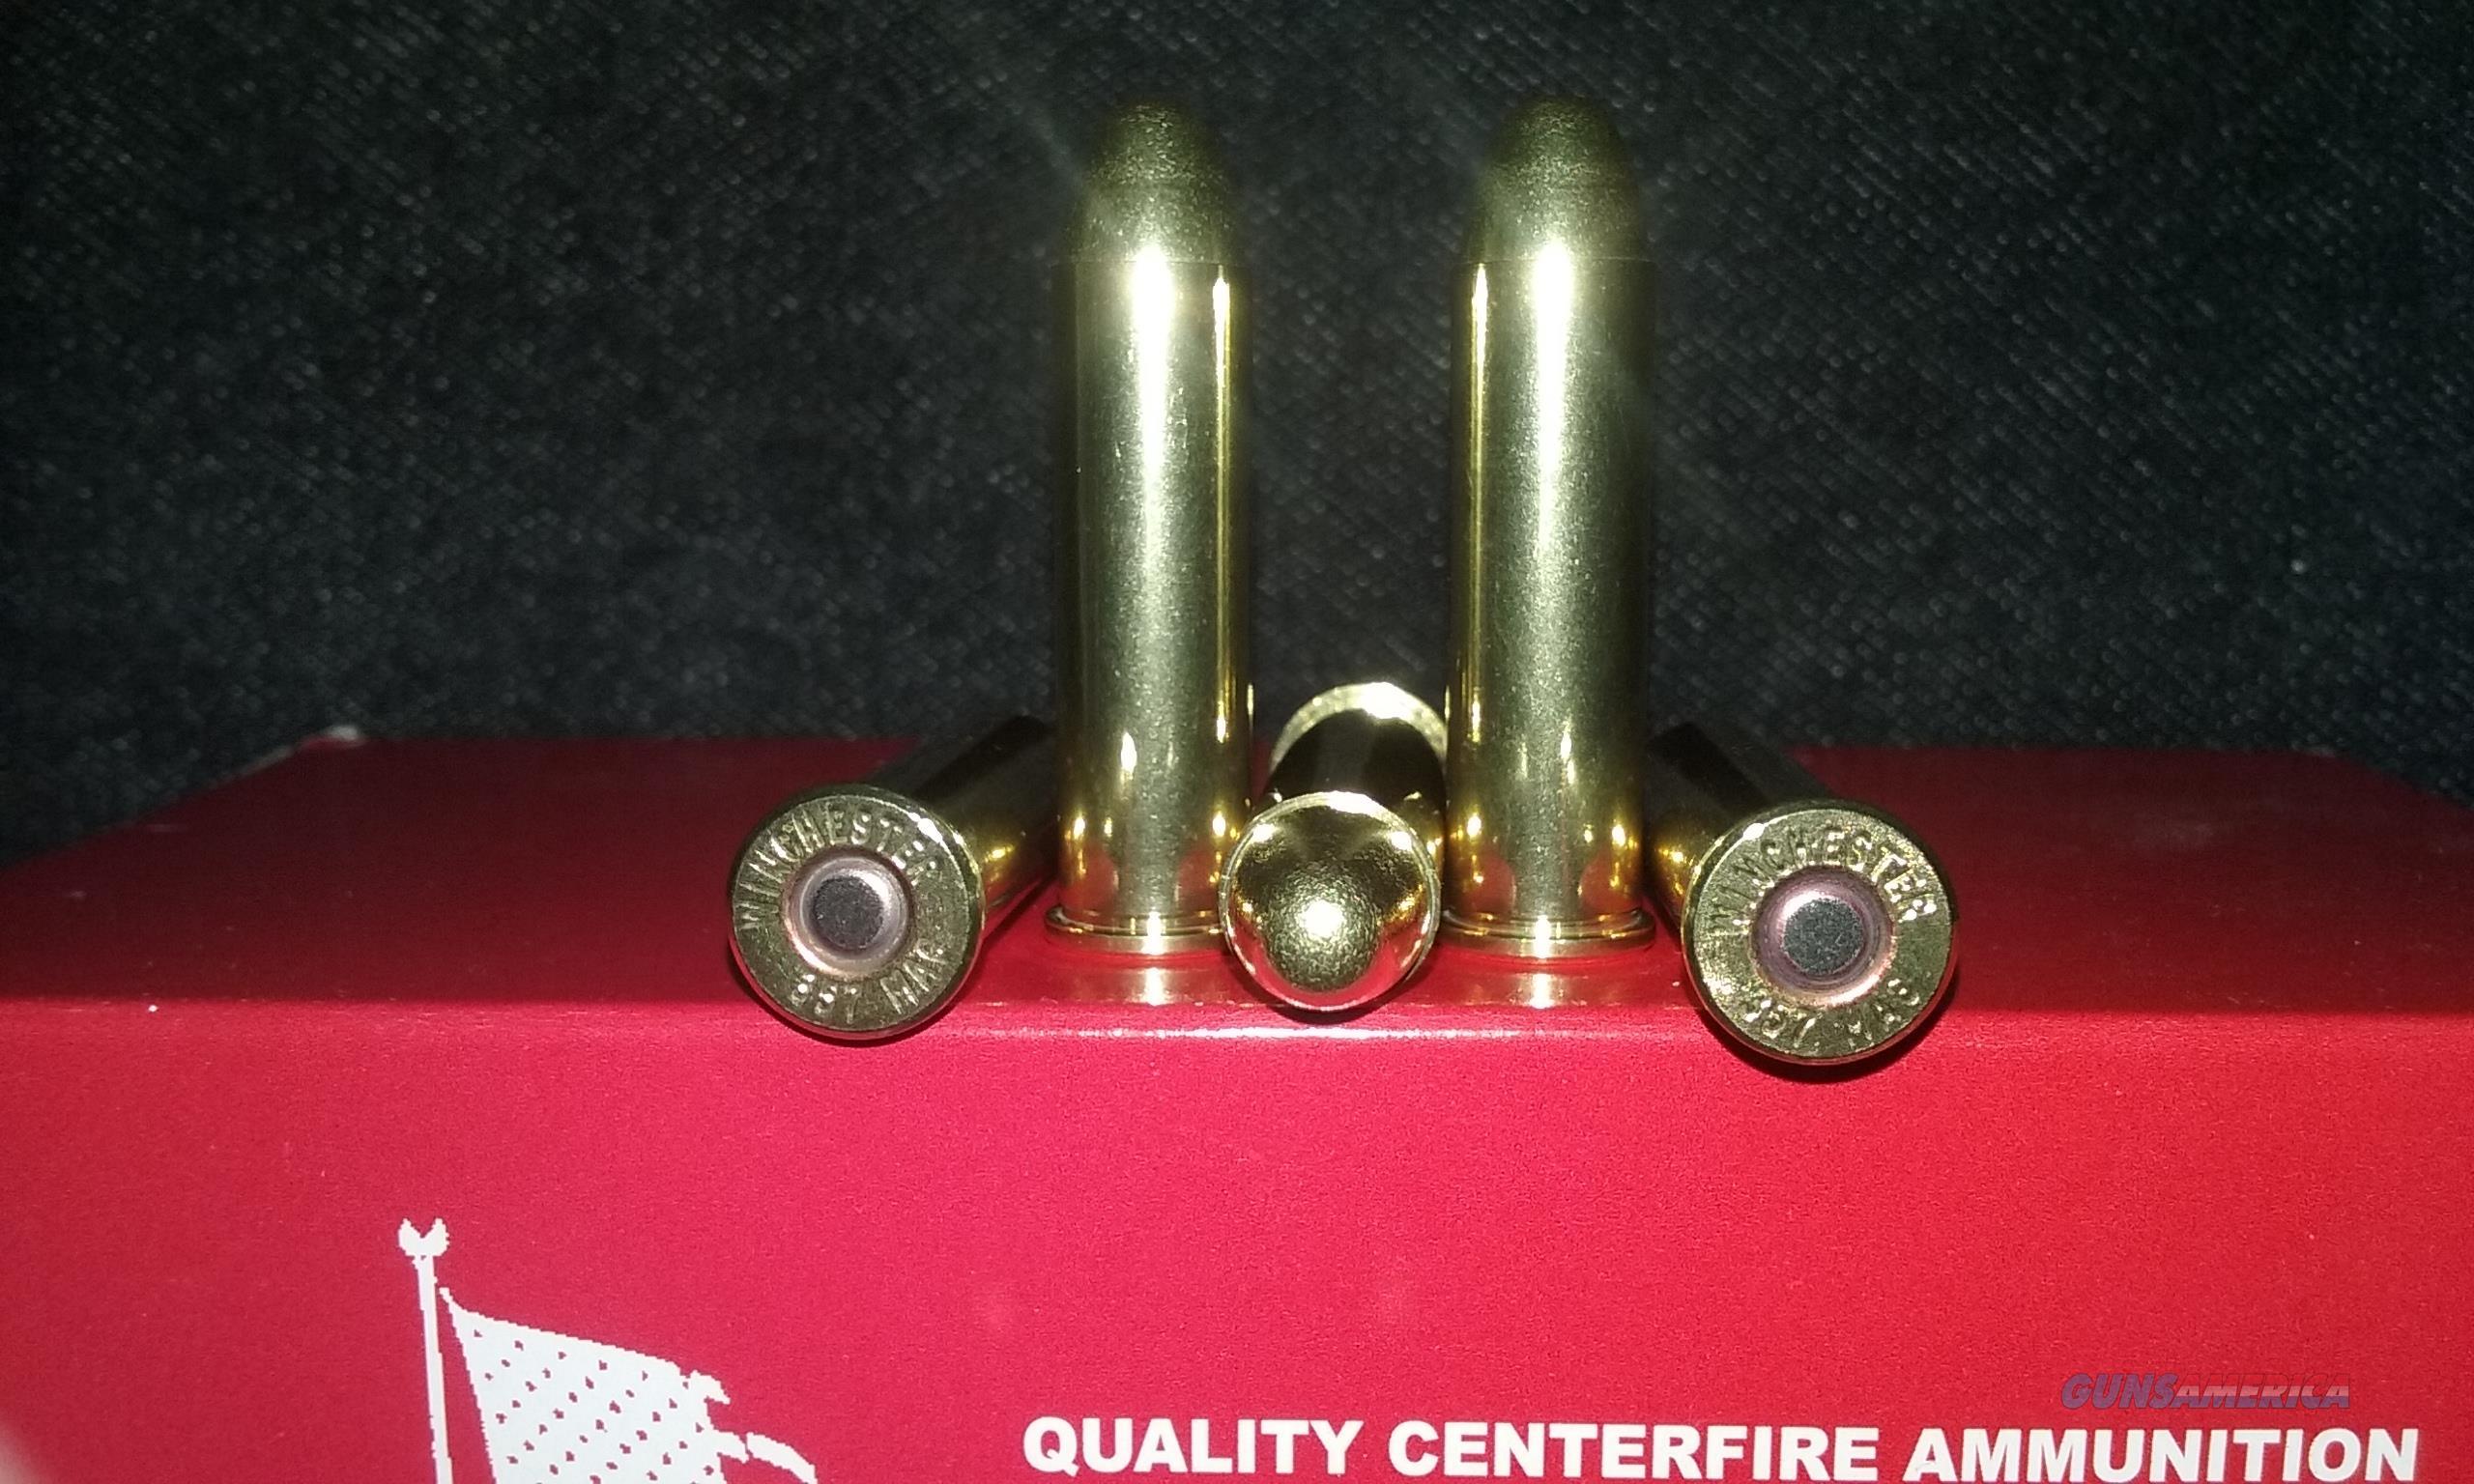 357 Magnum DESERT EAGLE / LAR GRIZZLY / COONAN Ammo. (357 S&W Magnum)  Non-Guns > Ammunition